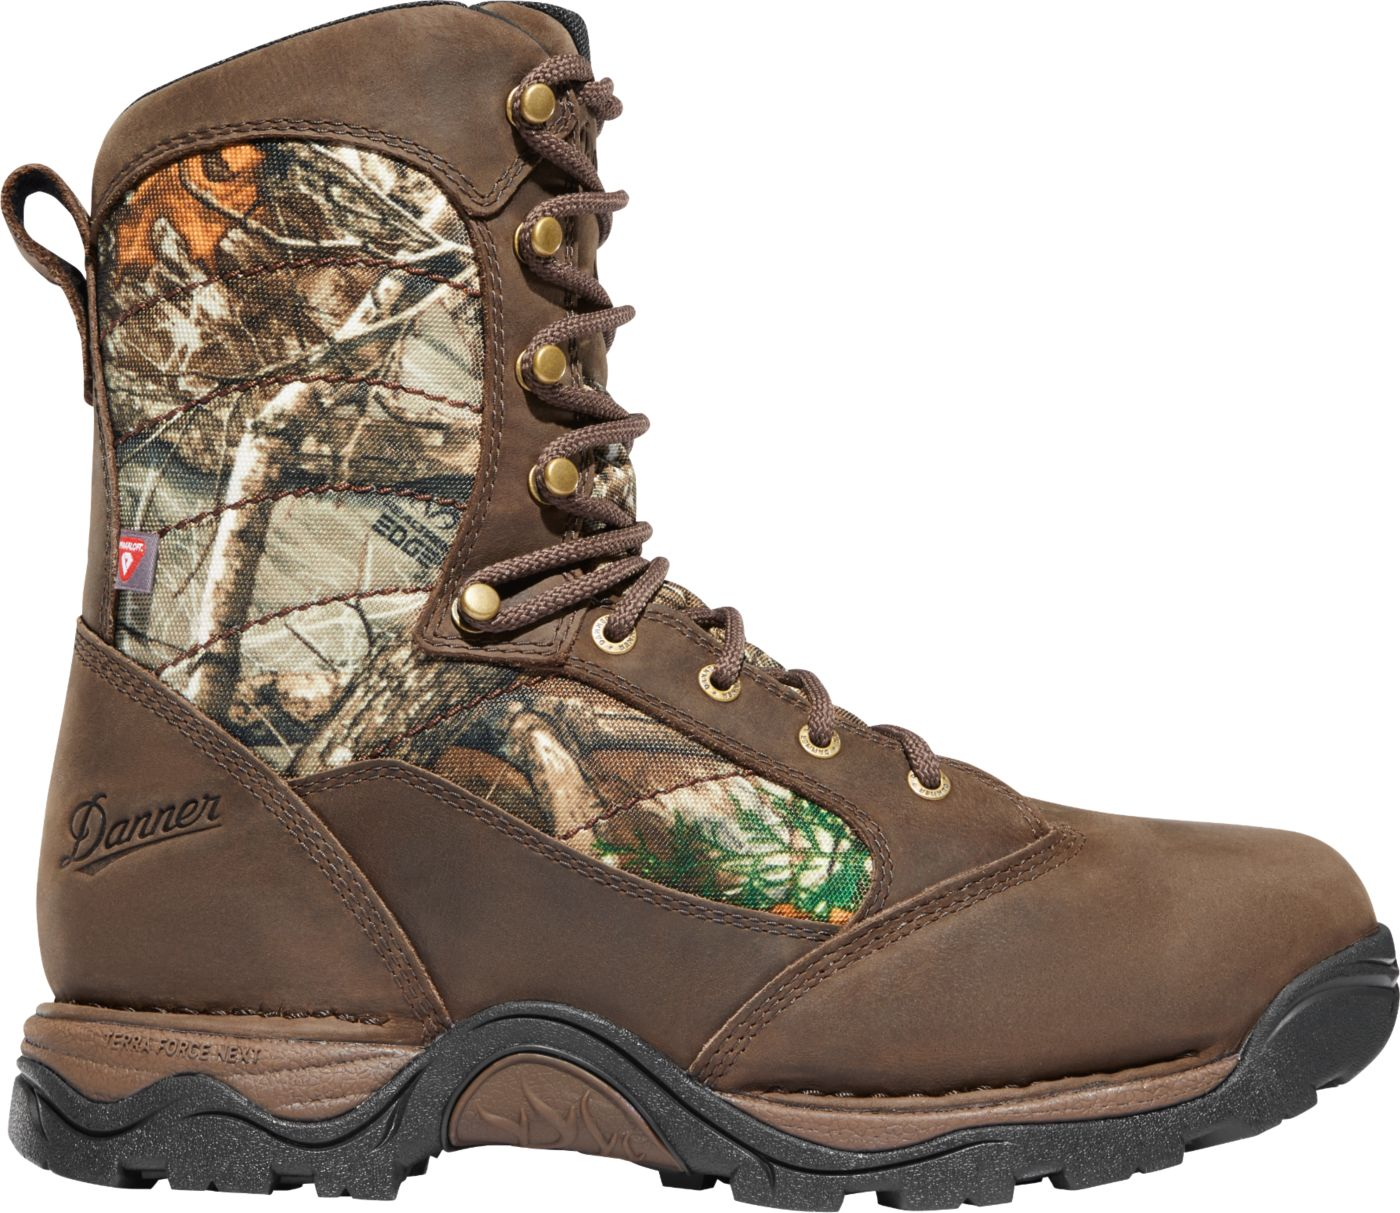 "Danner Men's Pronghorn 8"" Realtree Edge 400g Waterproof Hunting Boots"